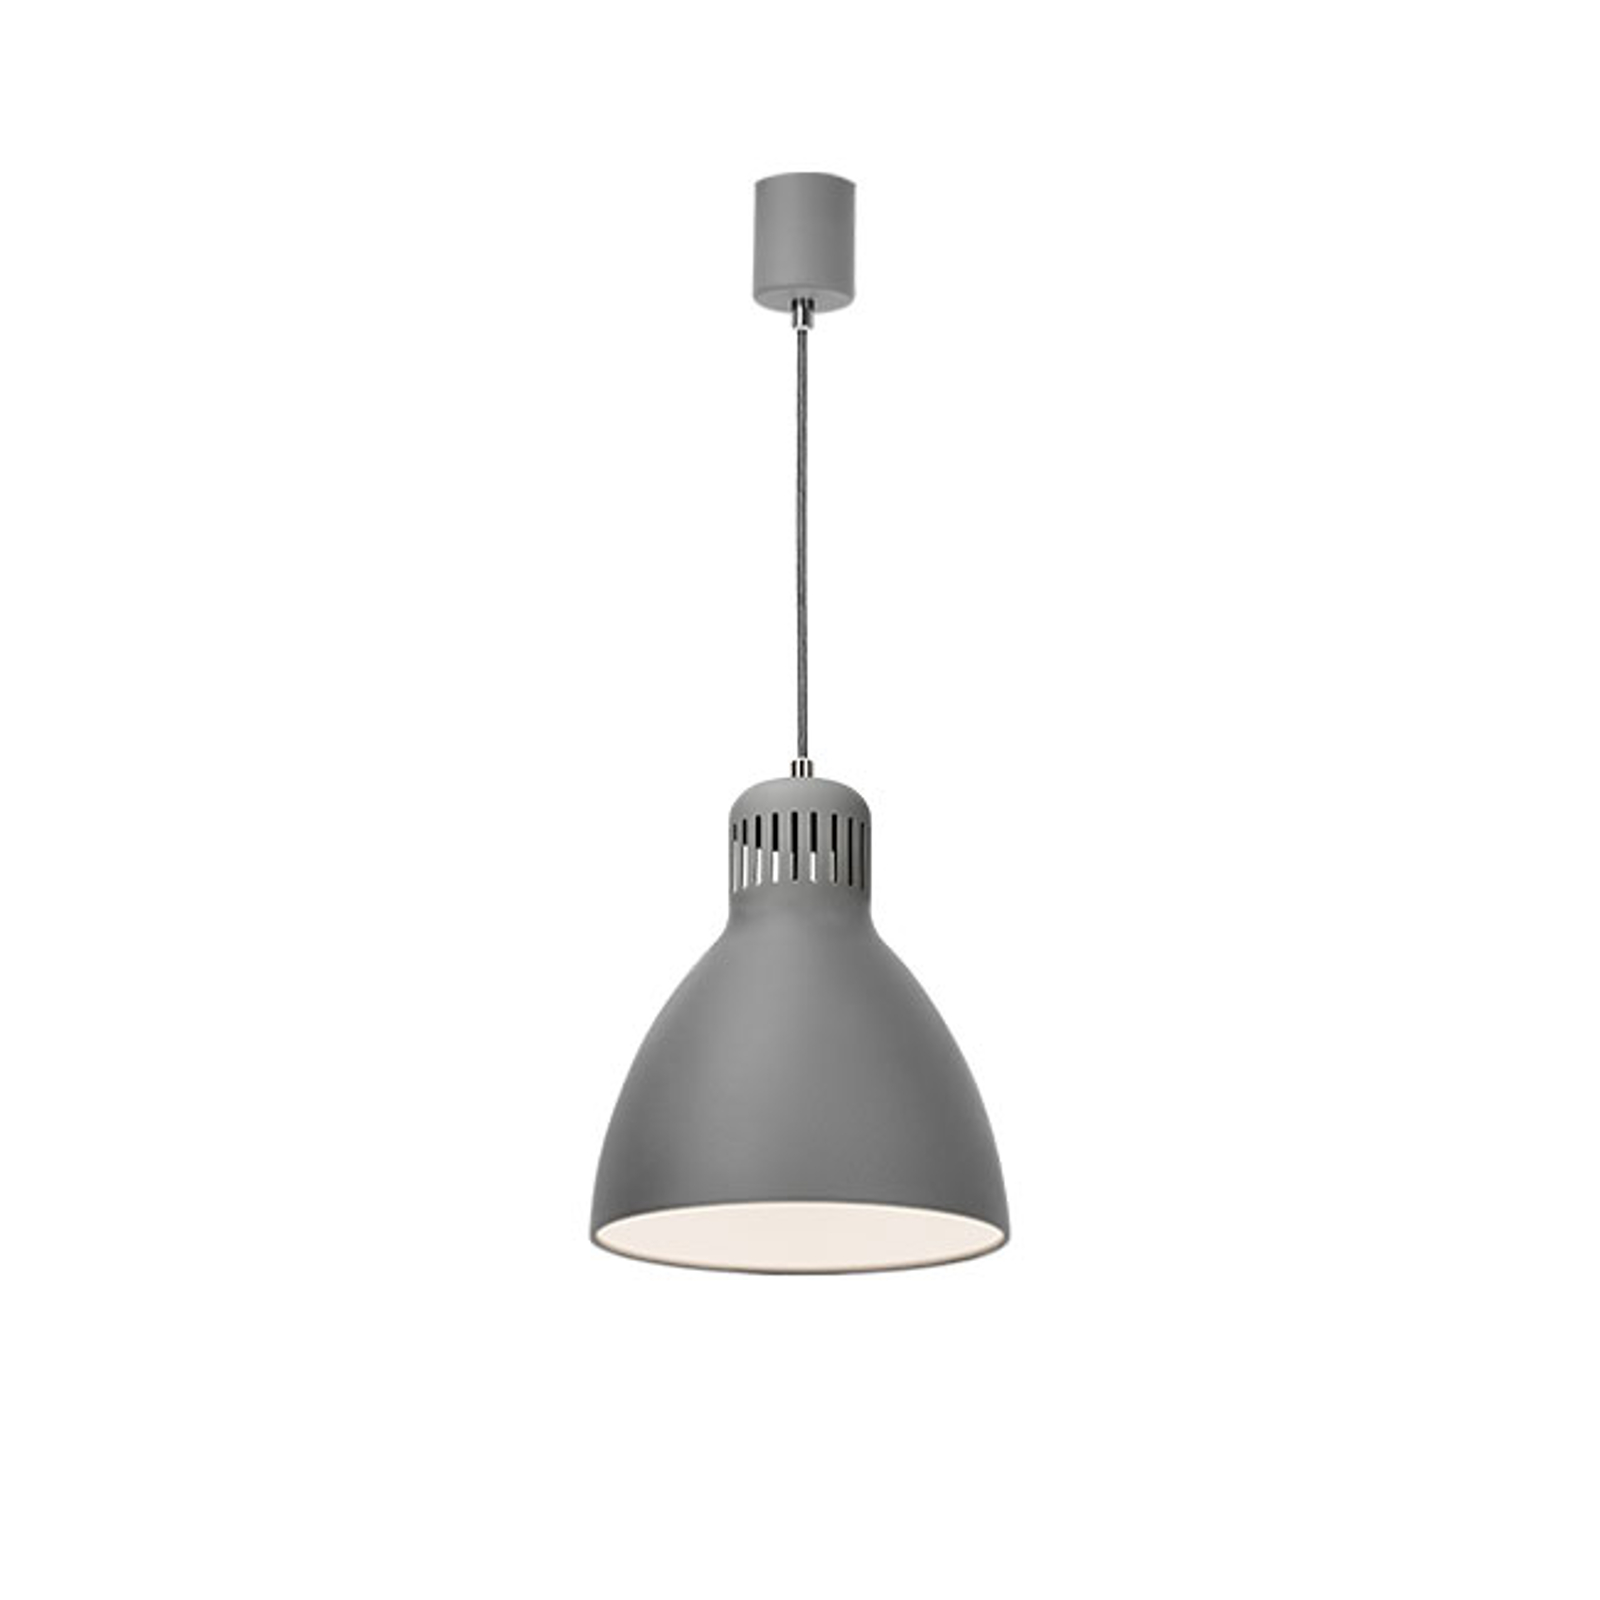 Suspension LED L-1, 3000K, grise